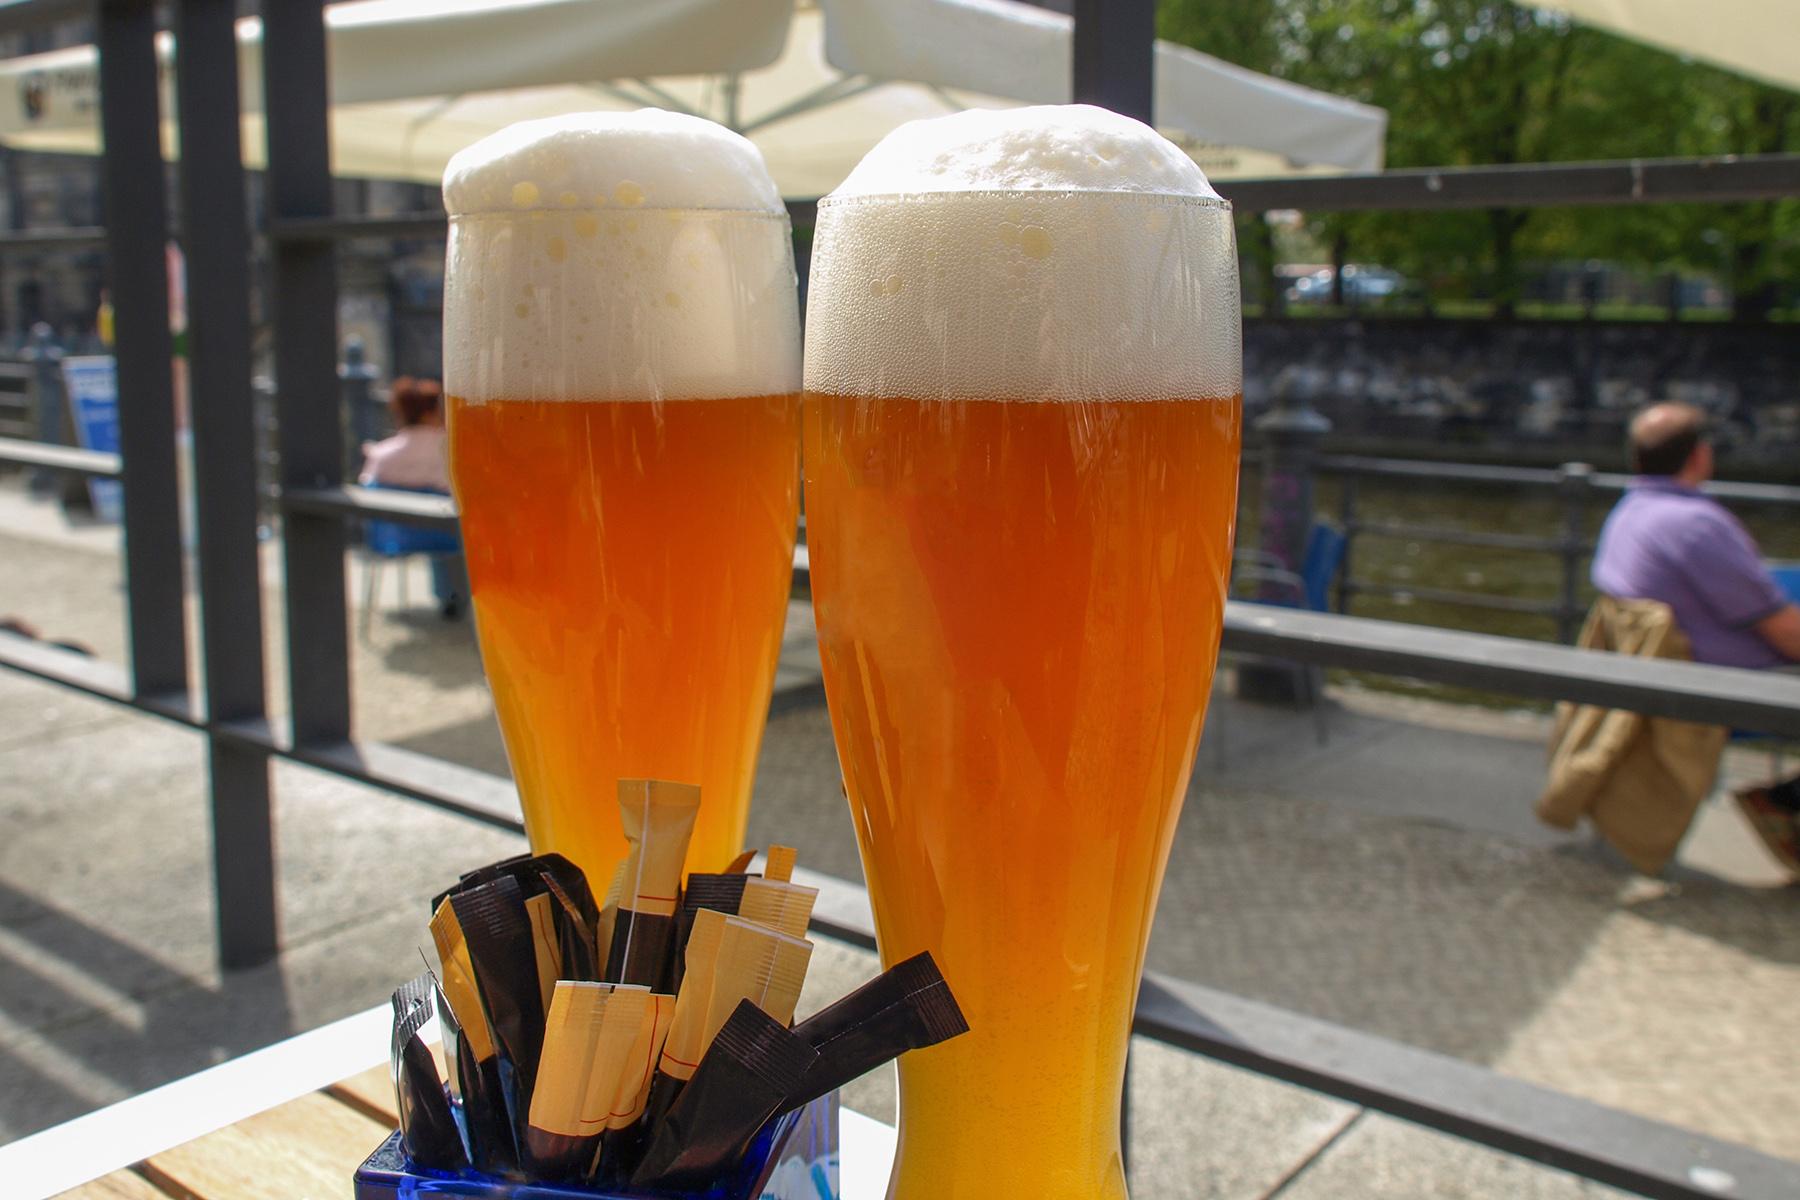 Two Hefeweizen glasses